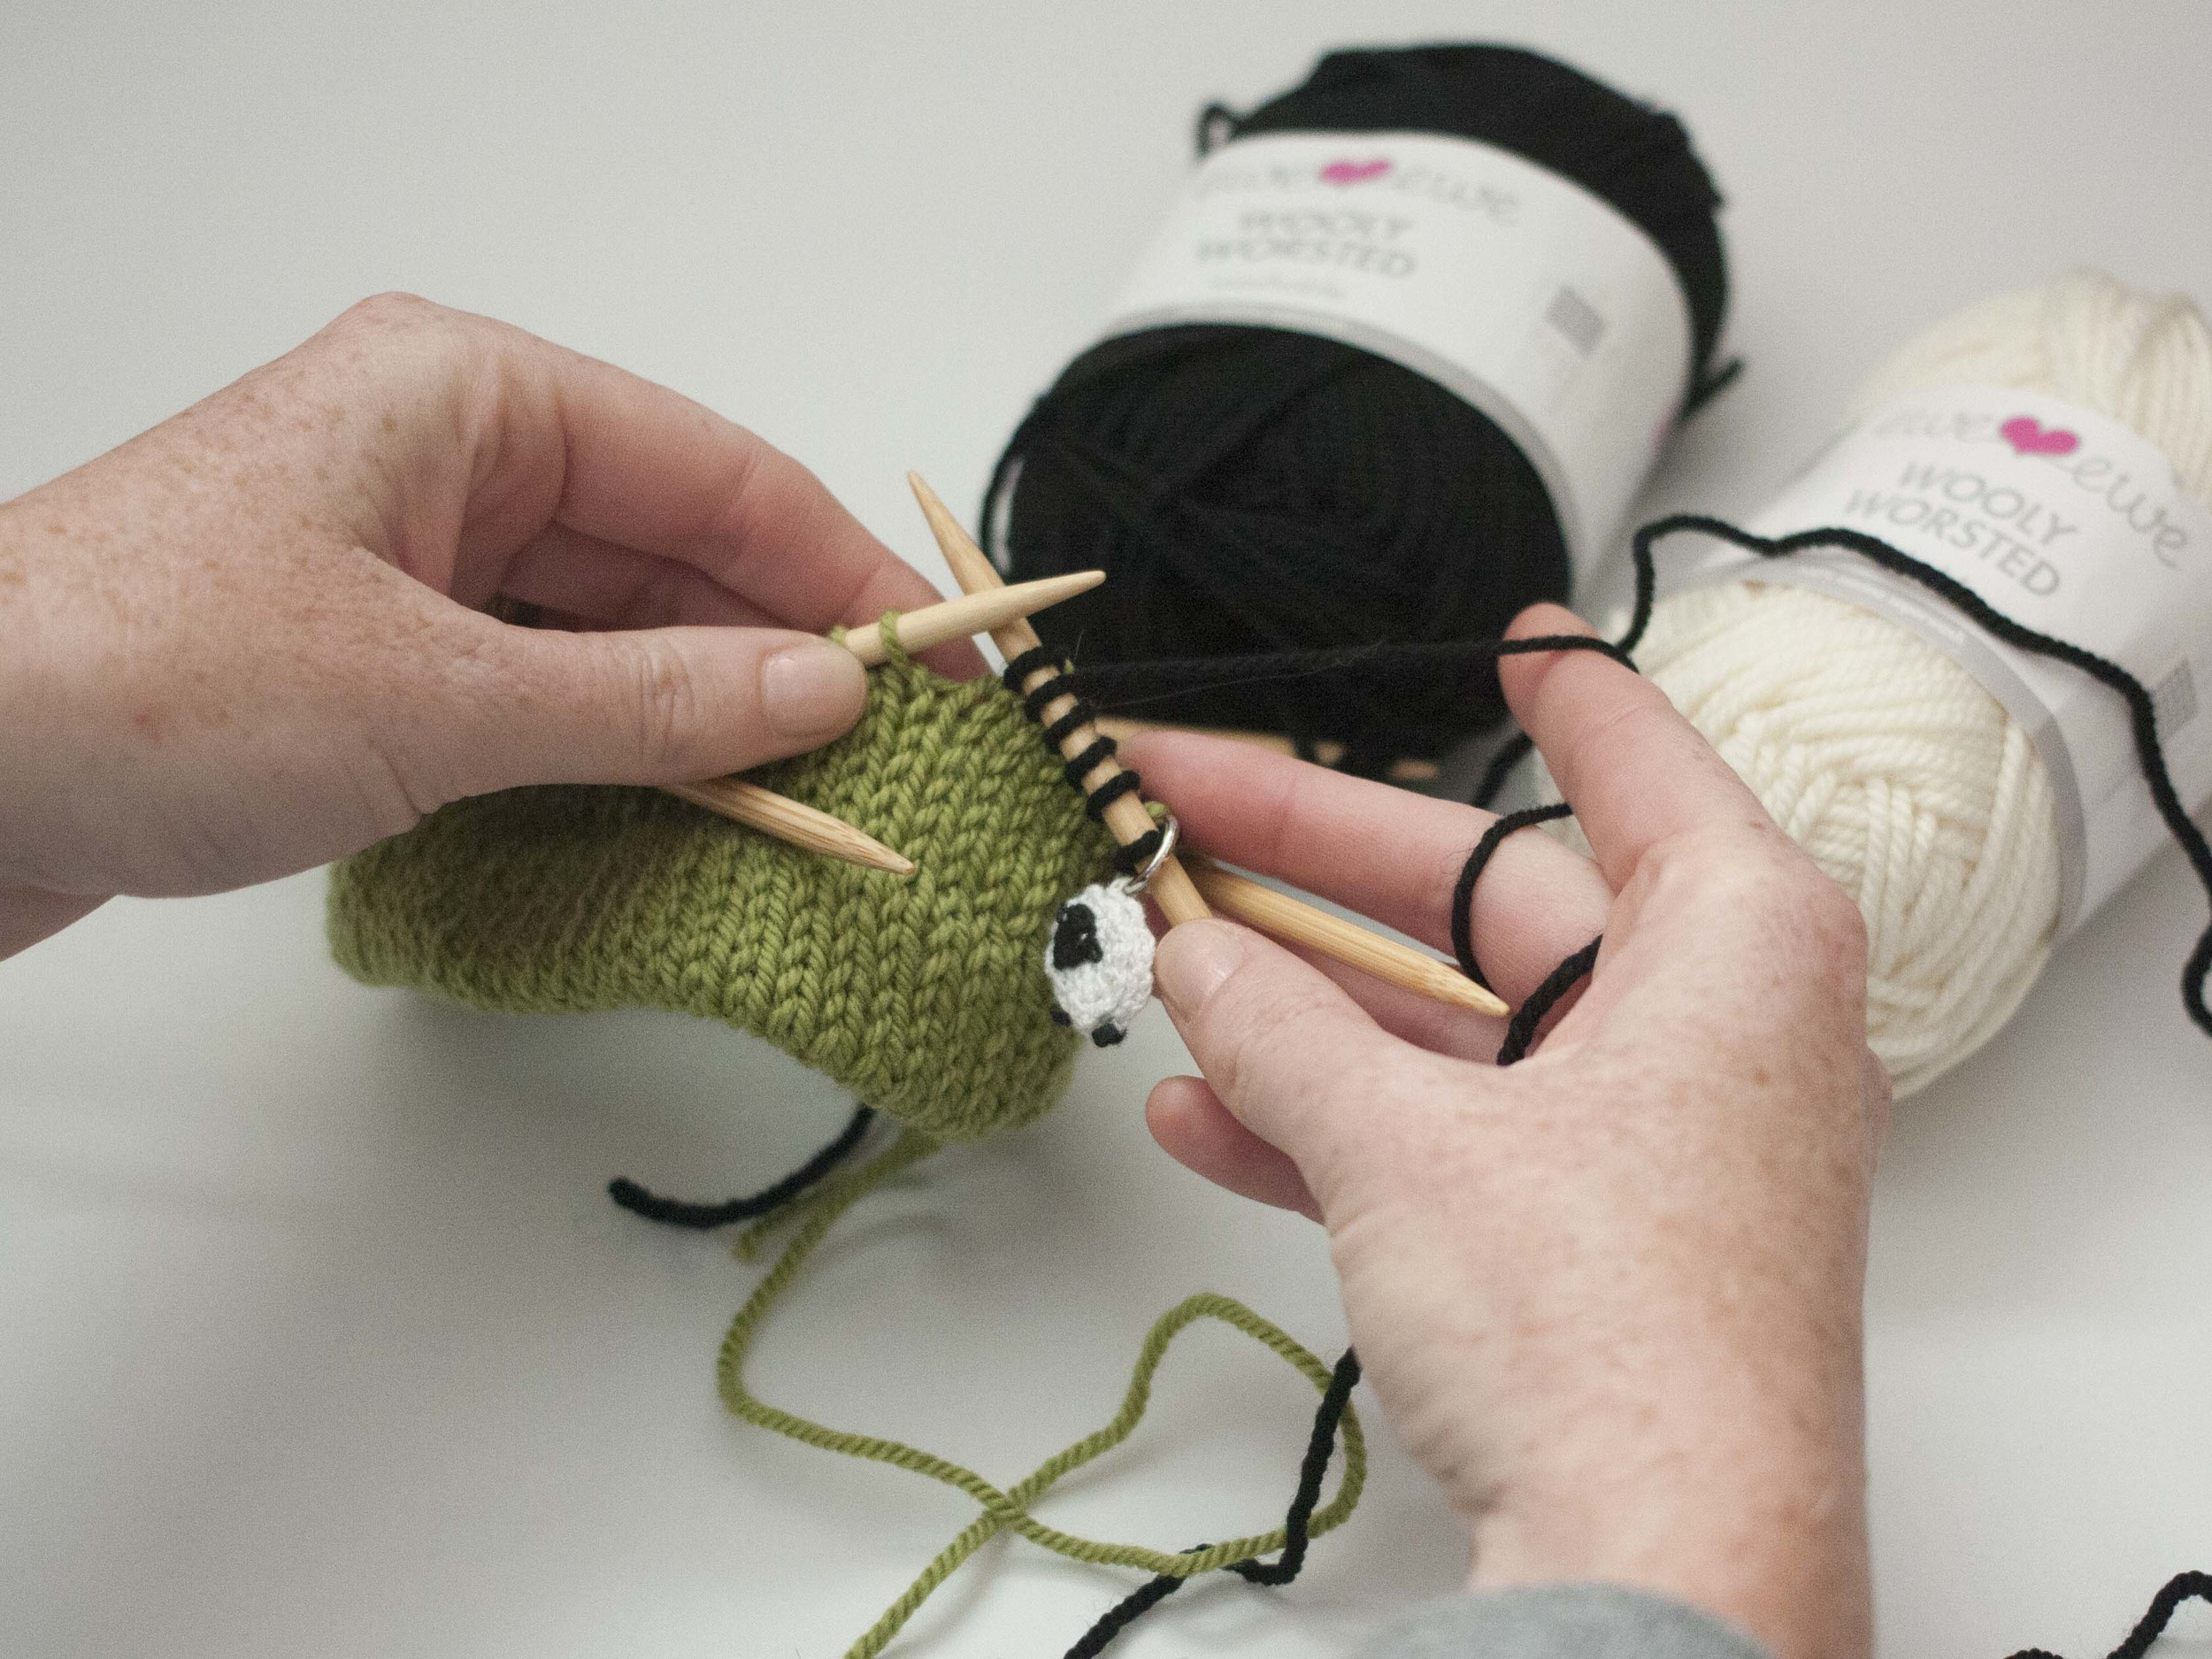 adding stripes in knitting